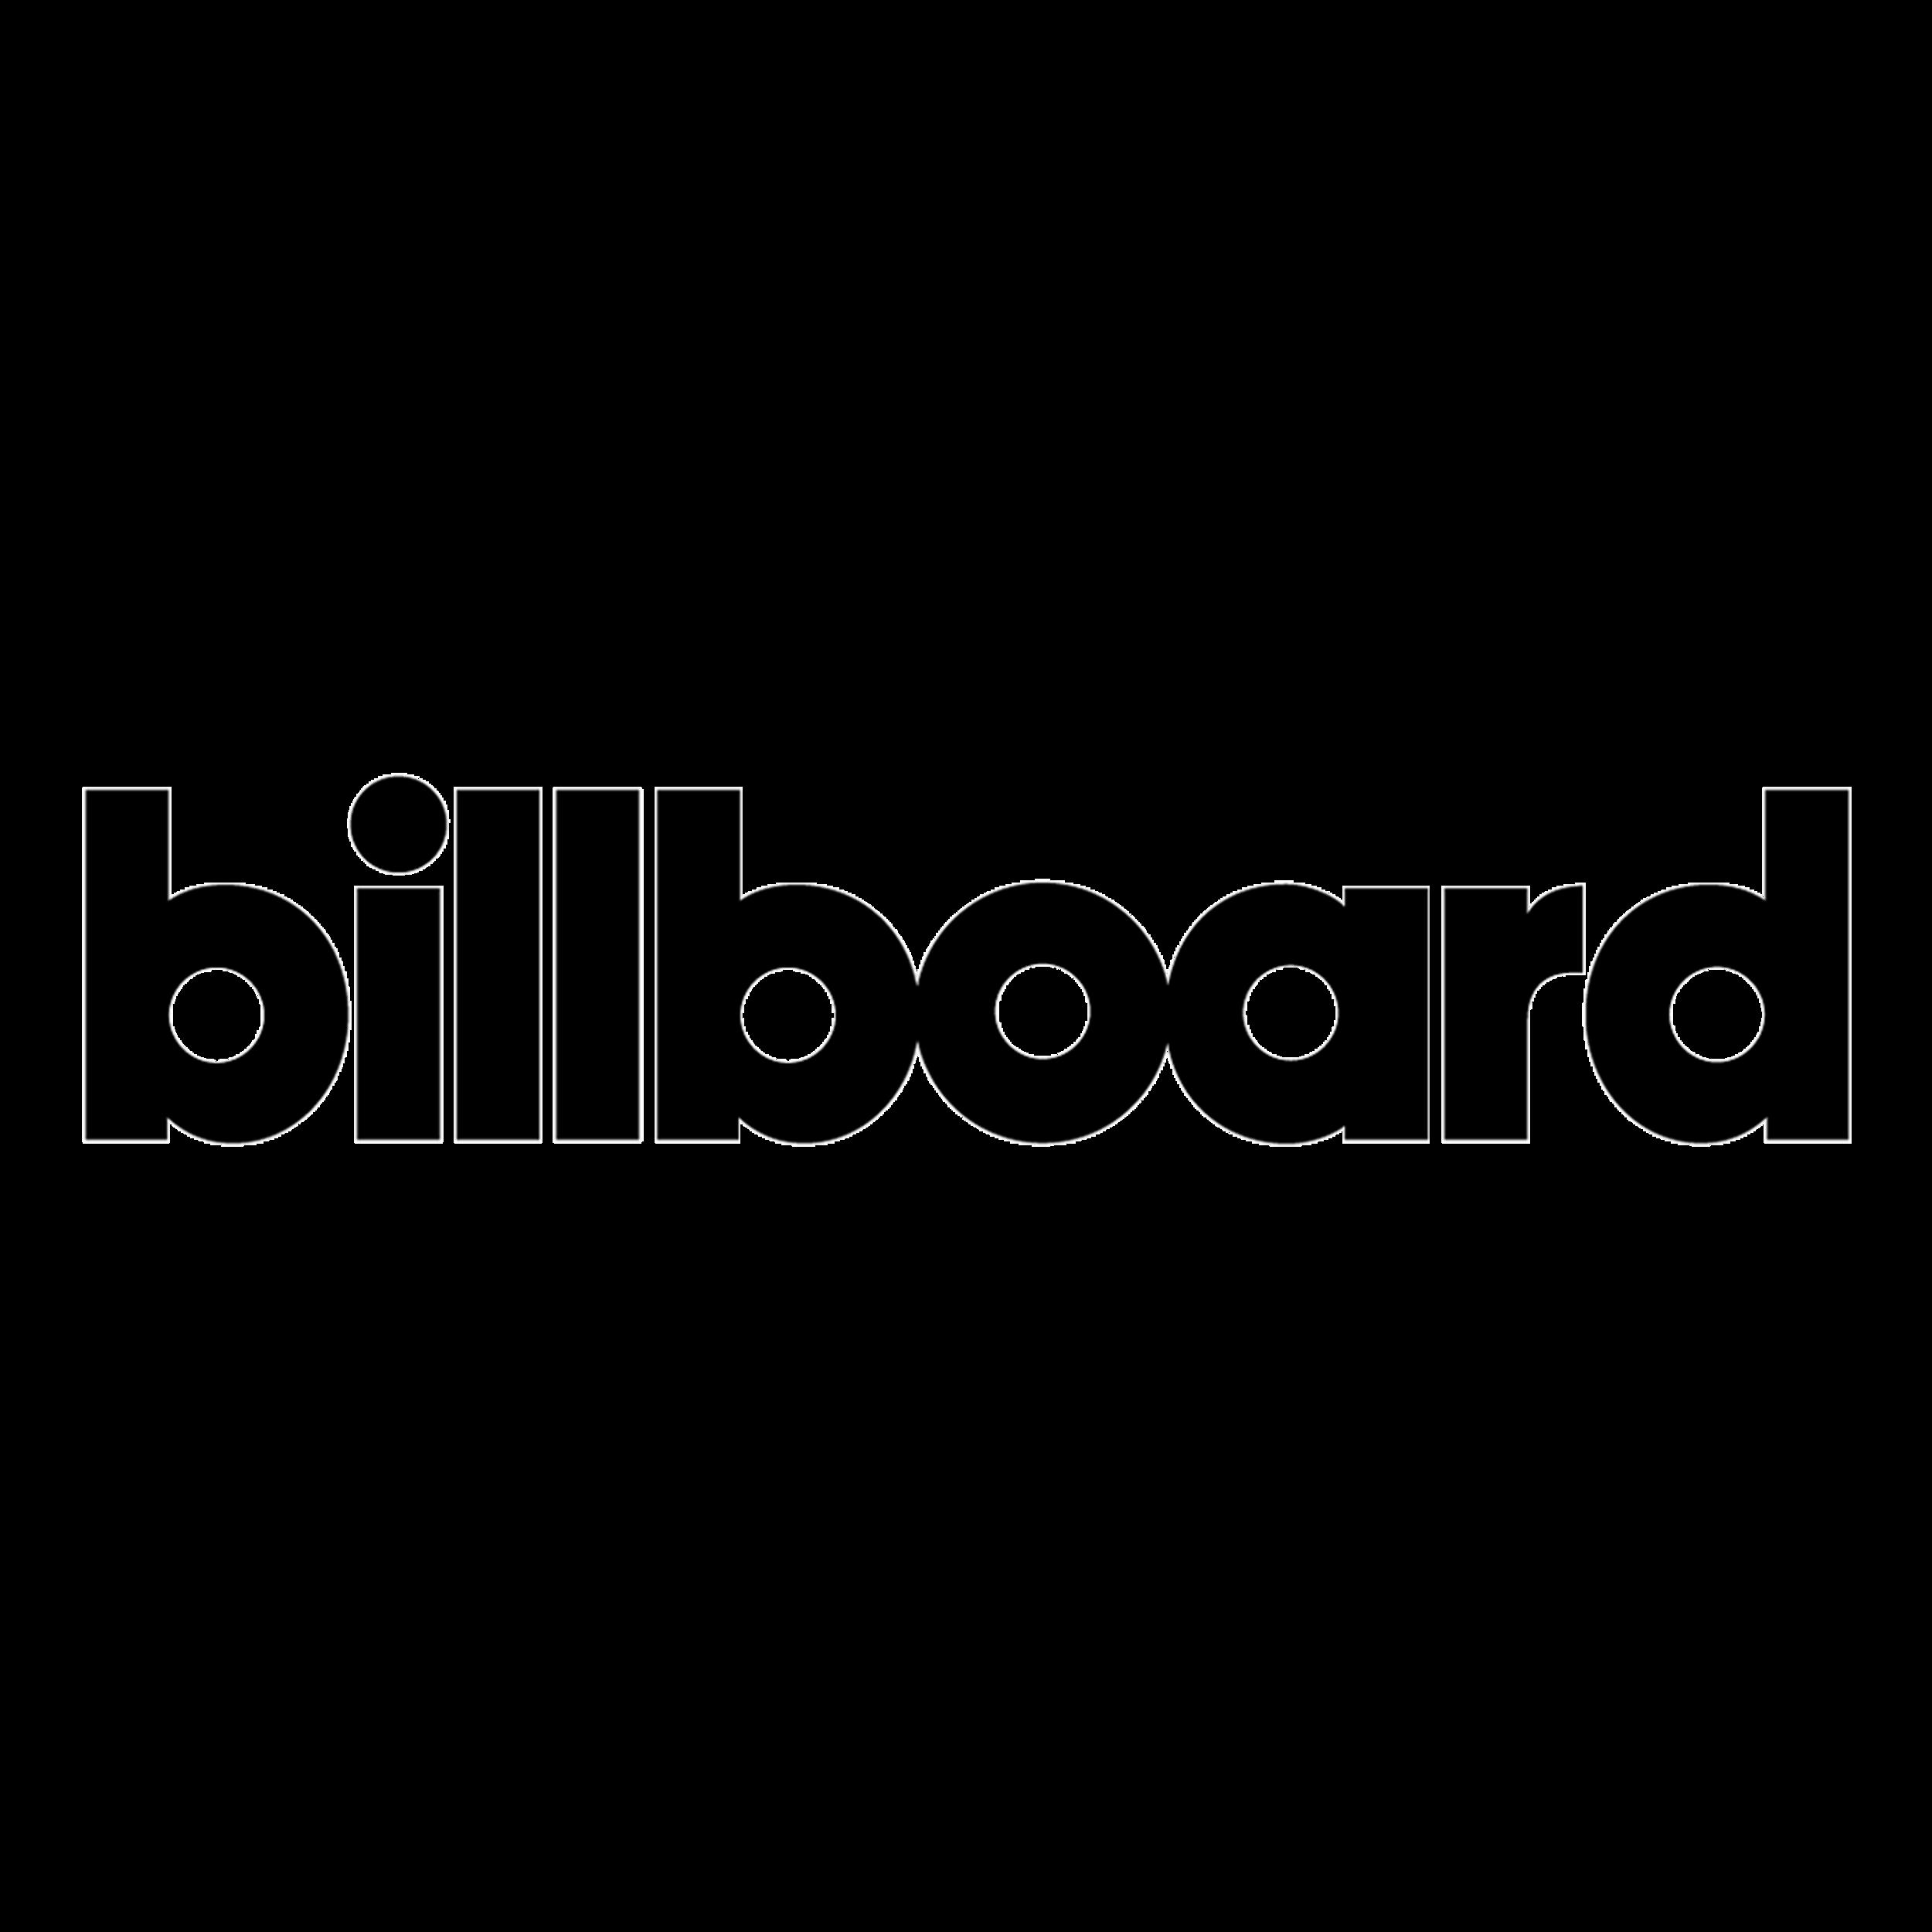 billboardlogo.png